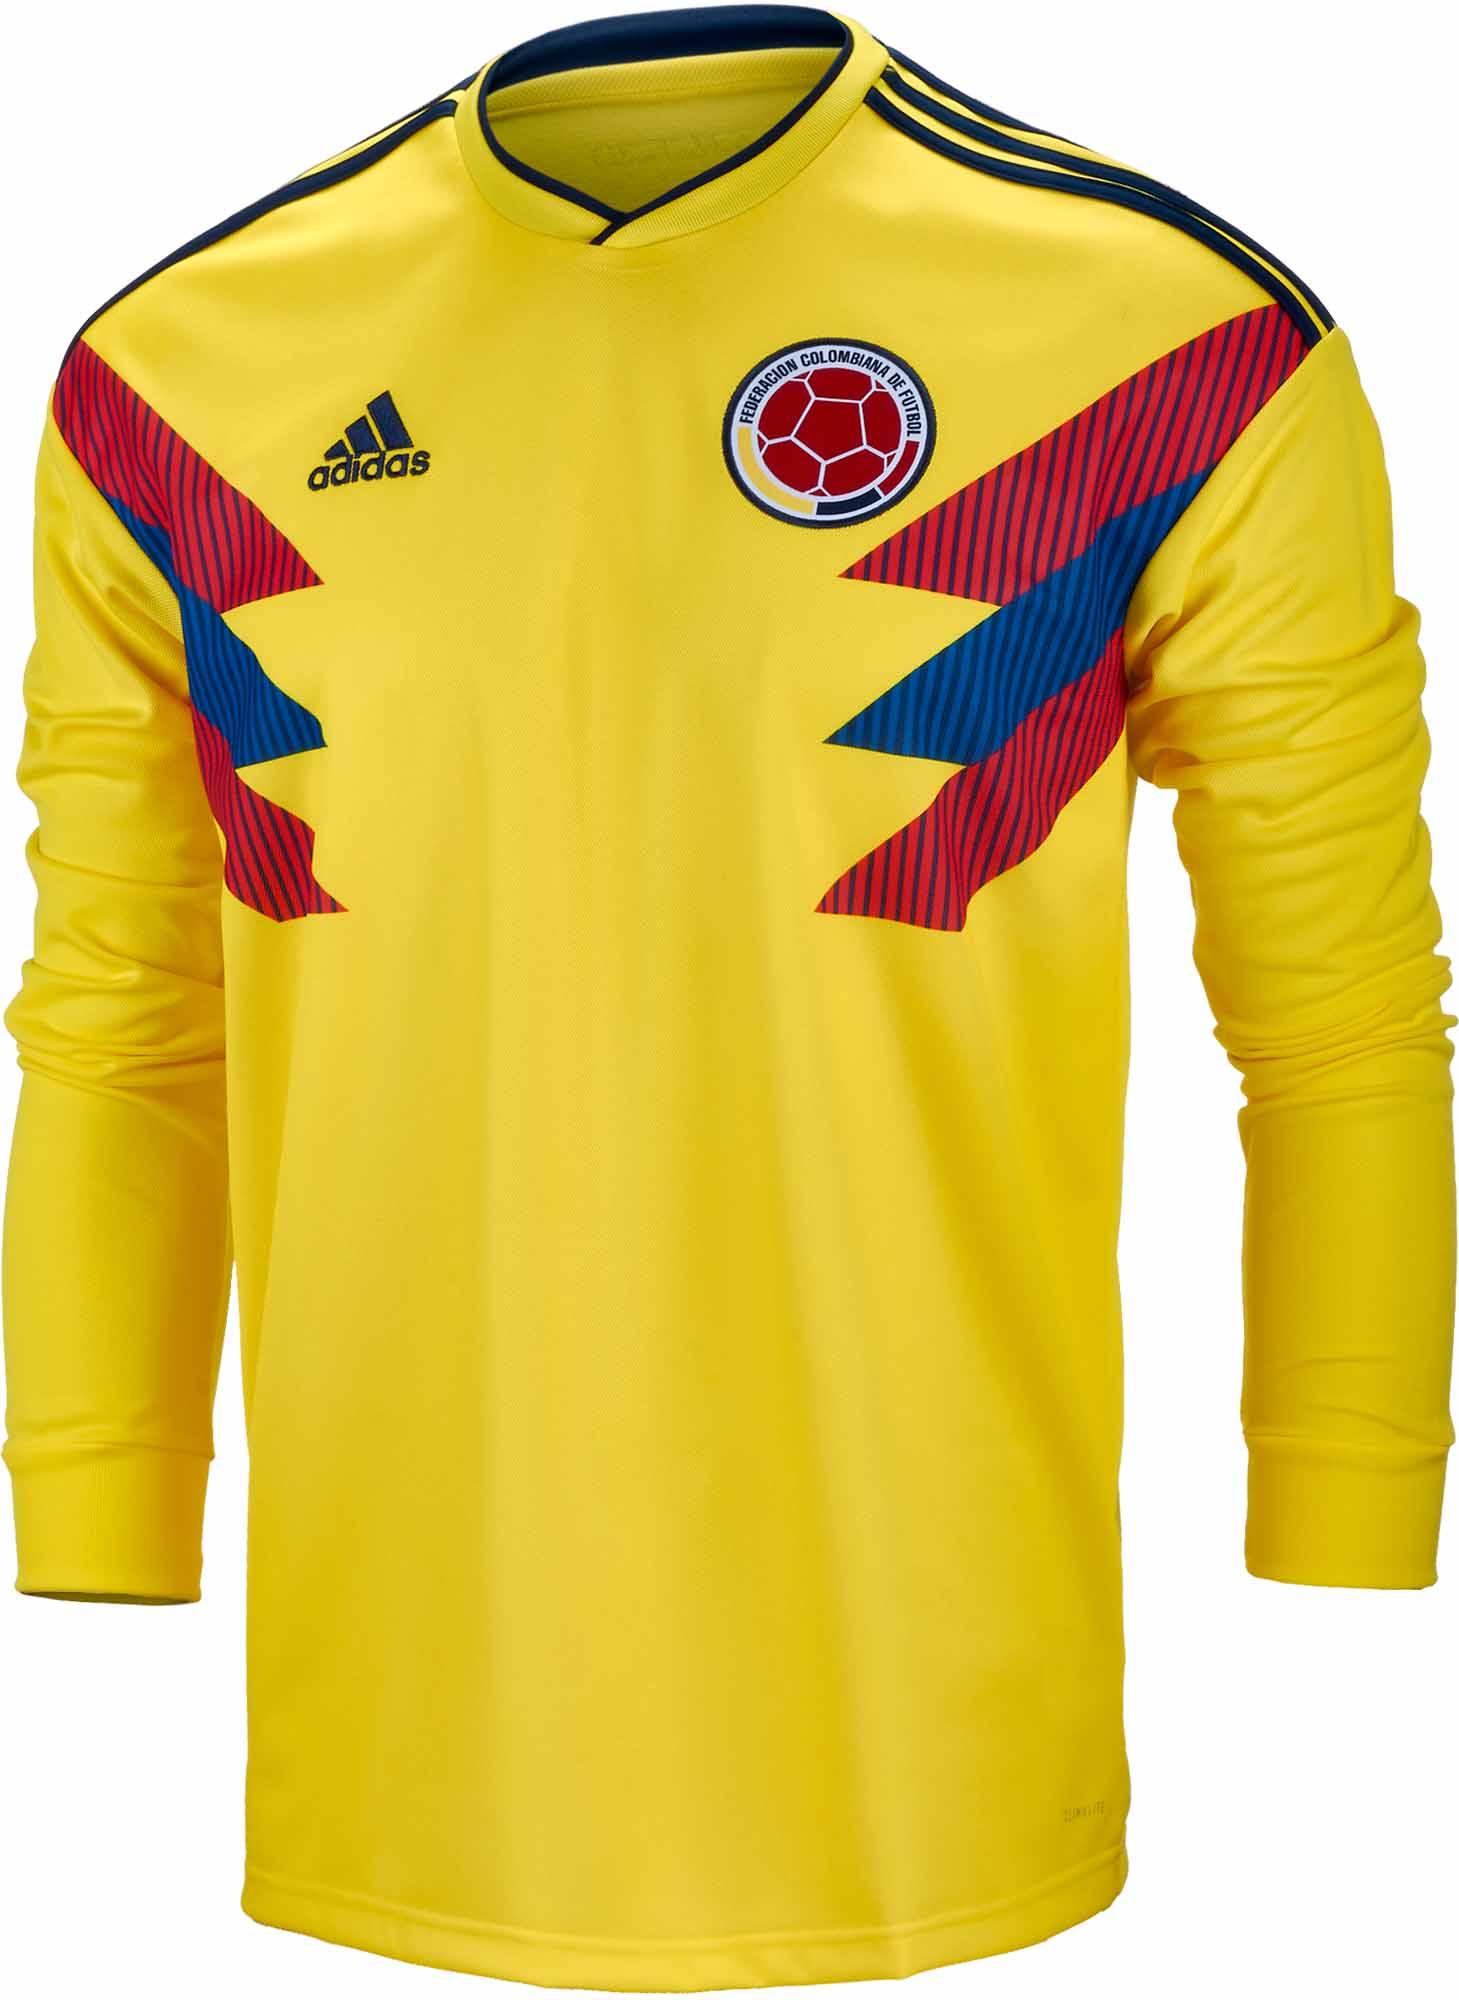 f6549fc7137b adidas Colombia L S Home Jersey 2018-19 - SoccerPro.com